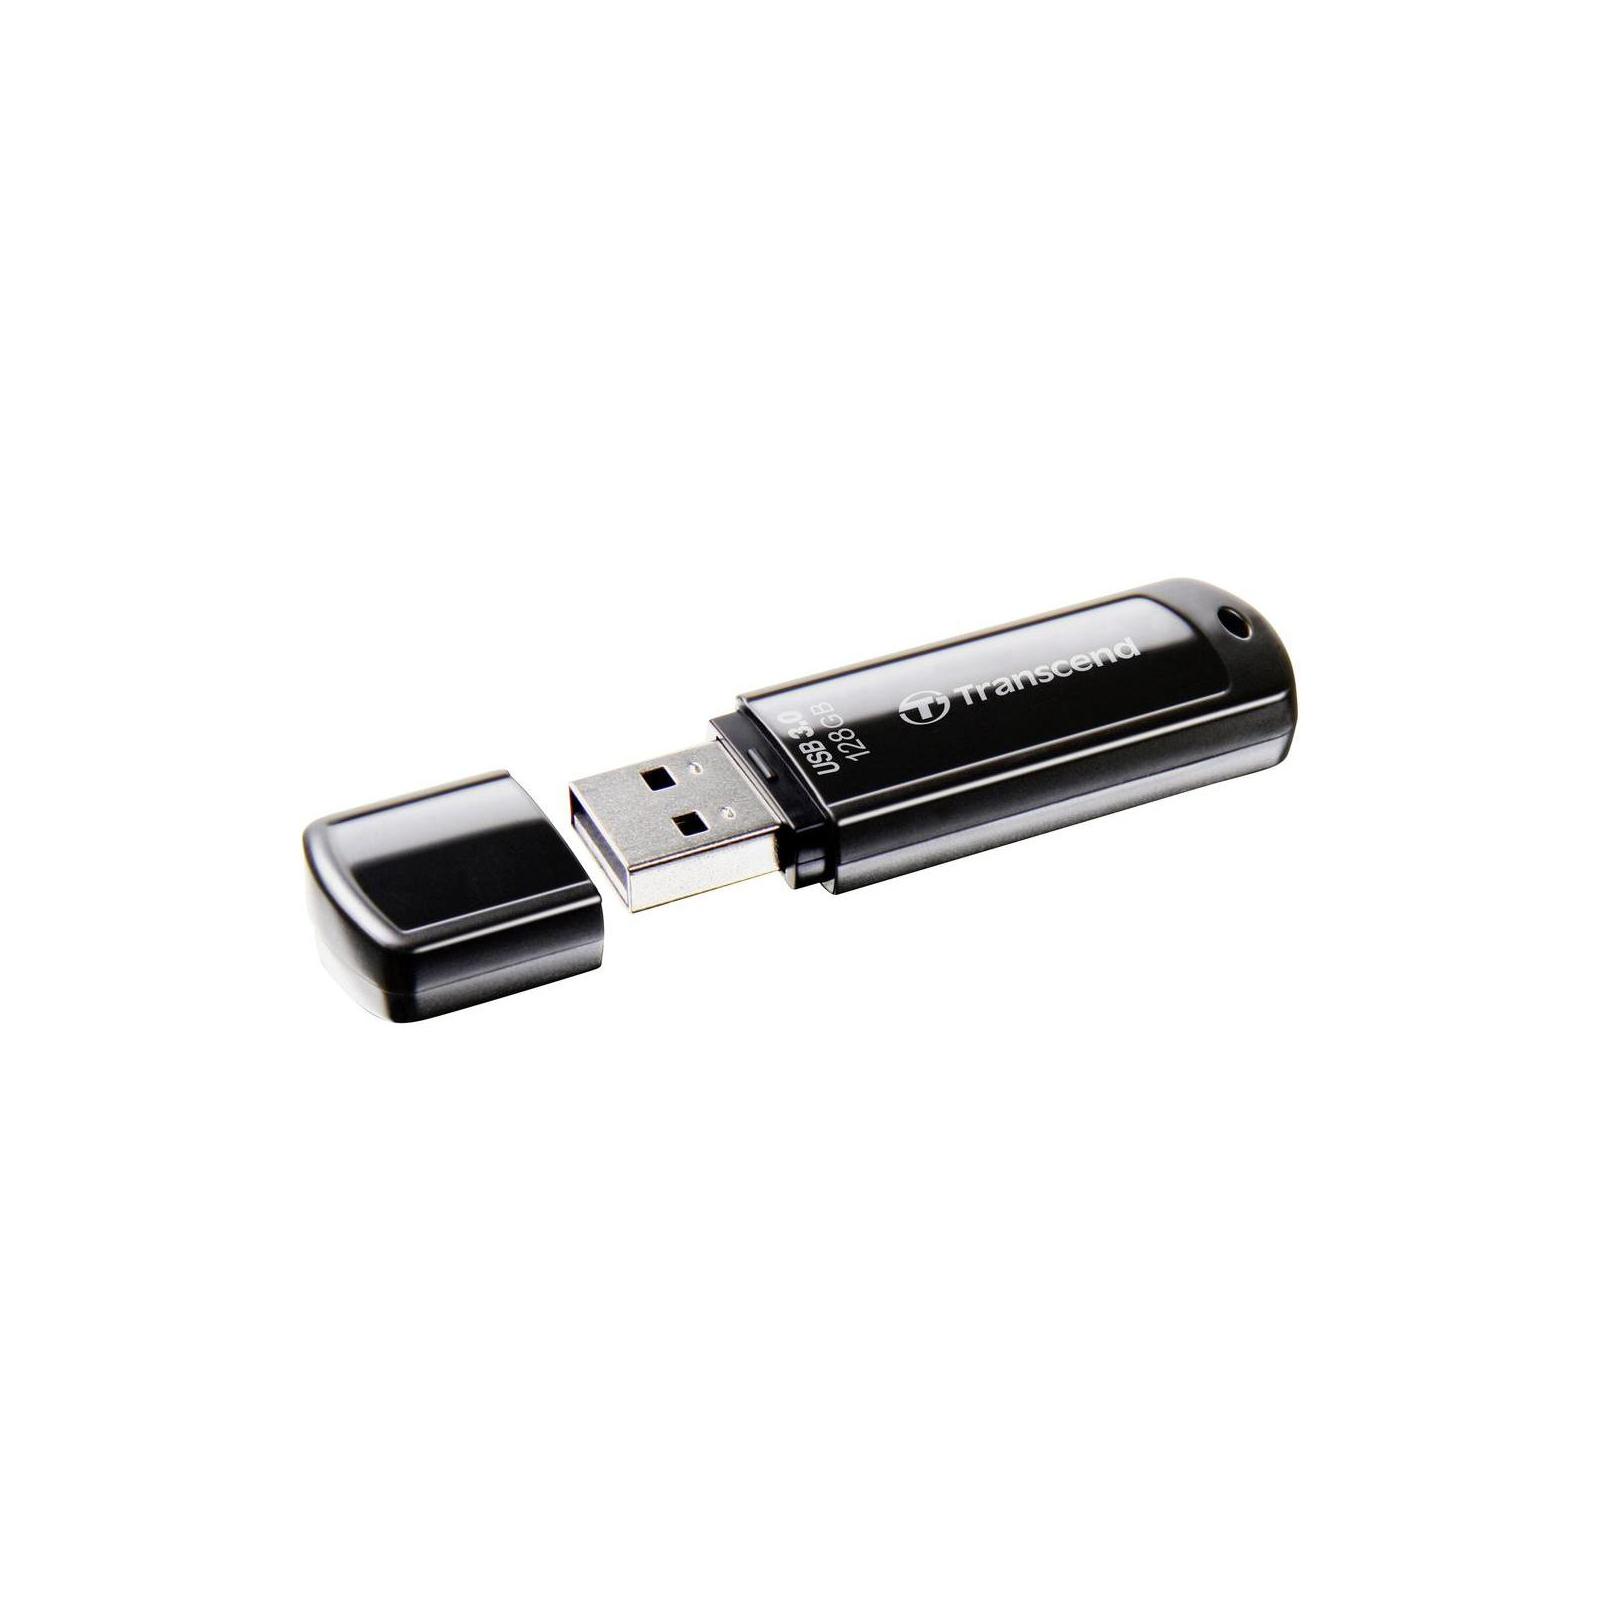 USB флеш накопитель Transcend 64Gb JetFlash 700 (TS64GJF700) изображение 3